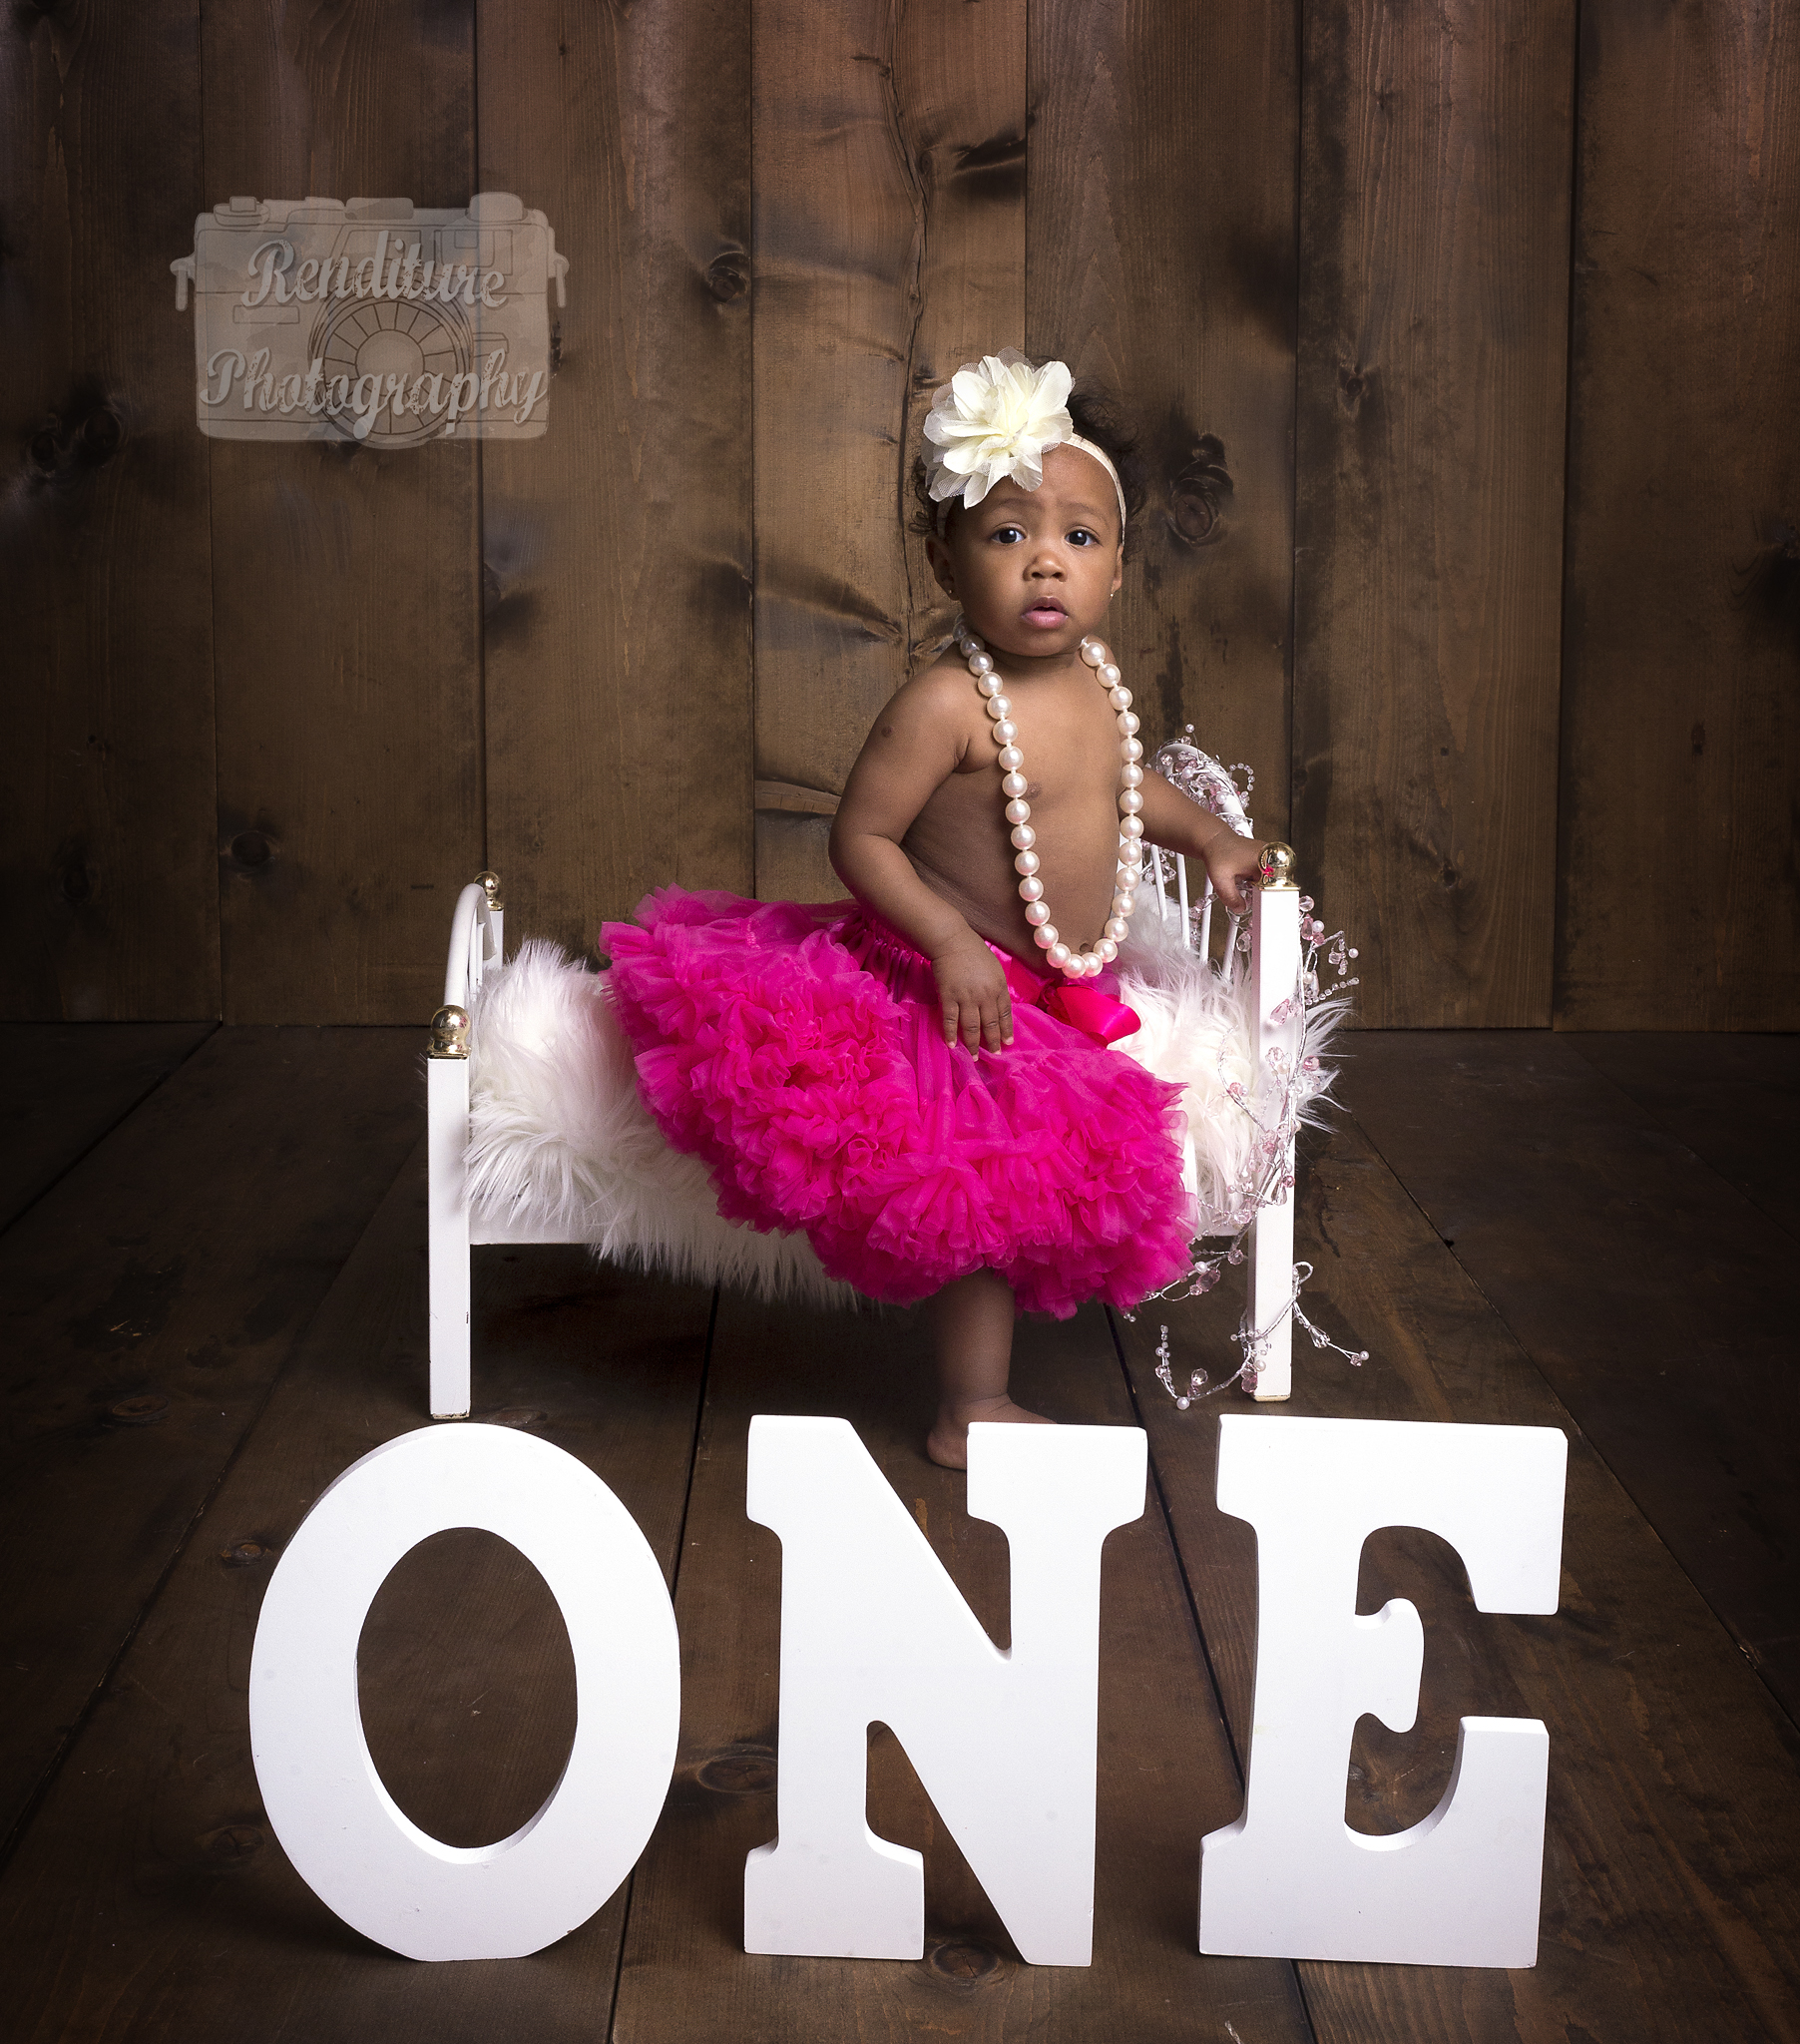 Saskatoon,Cake Smash,1 year,Birthday,Photographer,Baby,Photography,Photographer,Maternity,Pregnancy,Family, Renditure,Child,Infant,Tot,Kid,Photos,Saskatchewan,YXE,SK,Birthday Photographer,Saskatoon Photographer